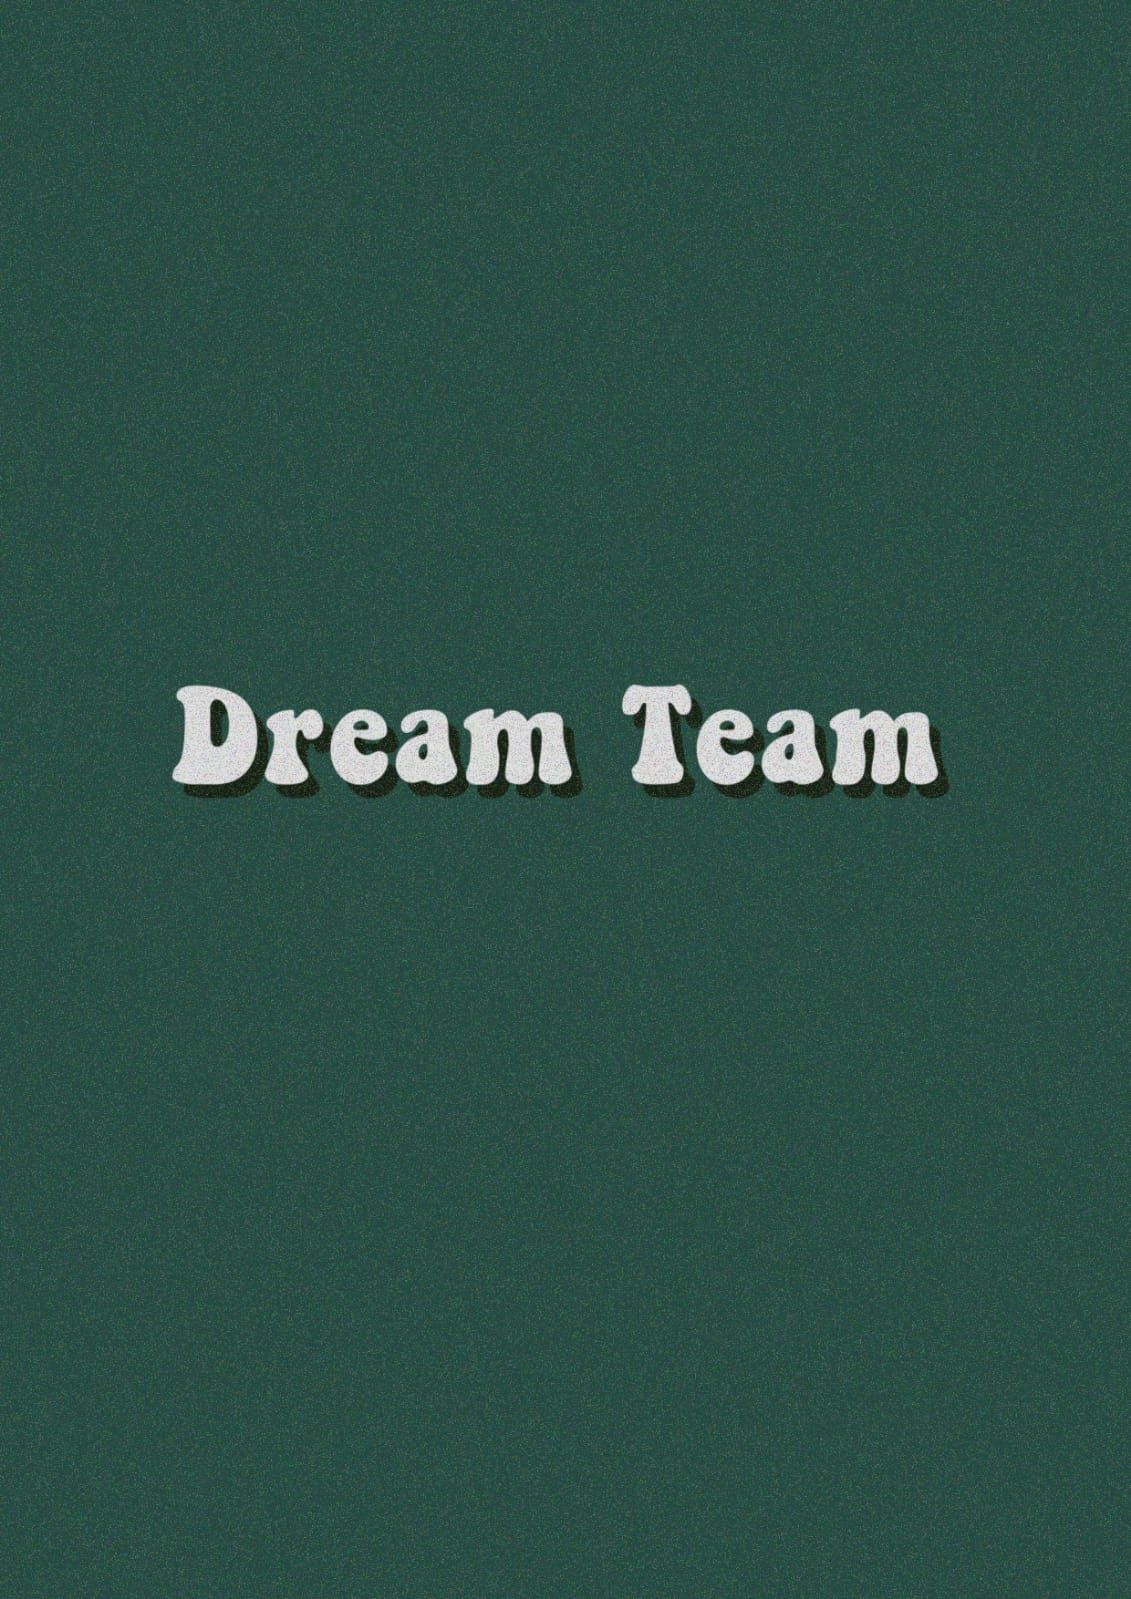 Dream Team wallpaper in 2020 Team wallpaper Dream team Team word 1131x1599